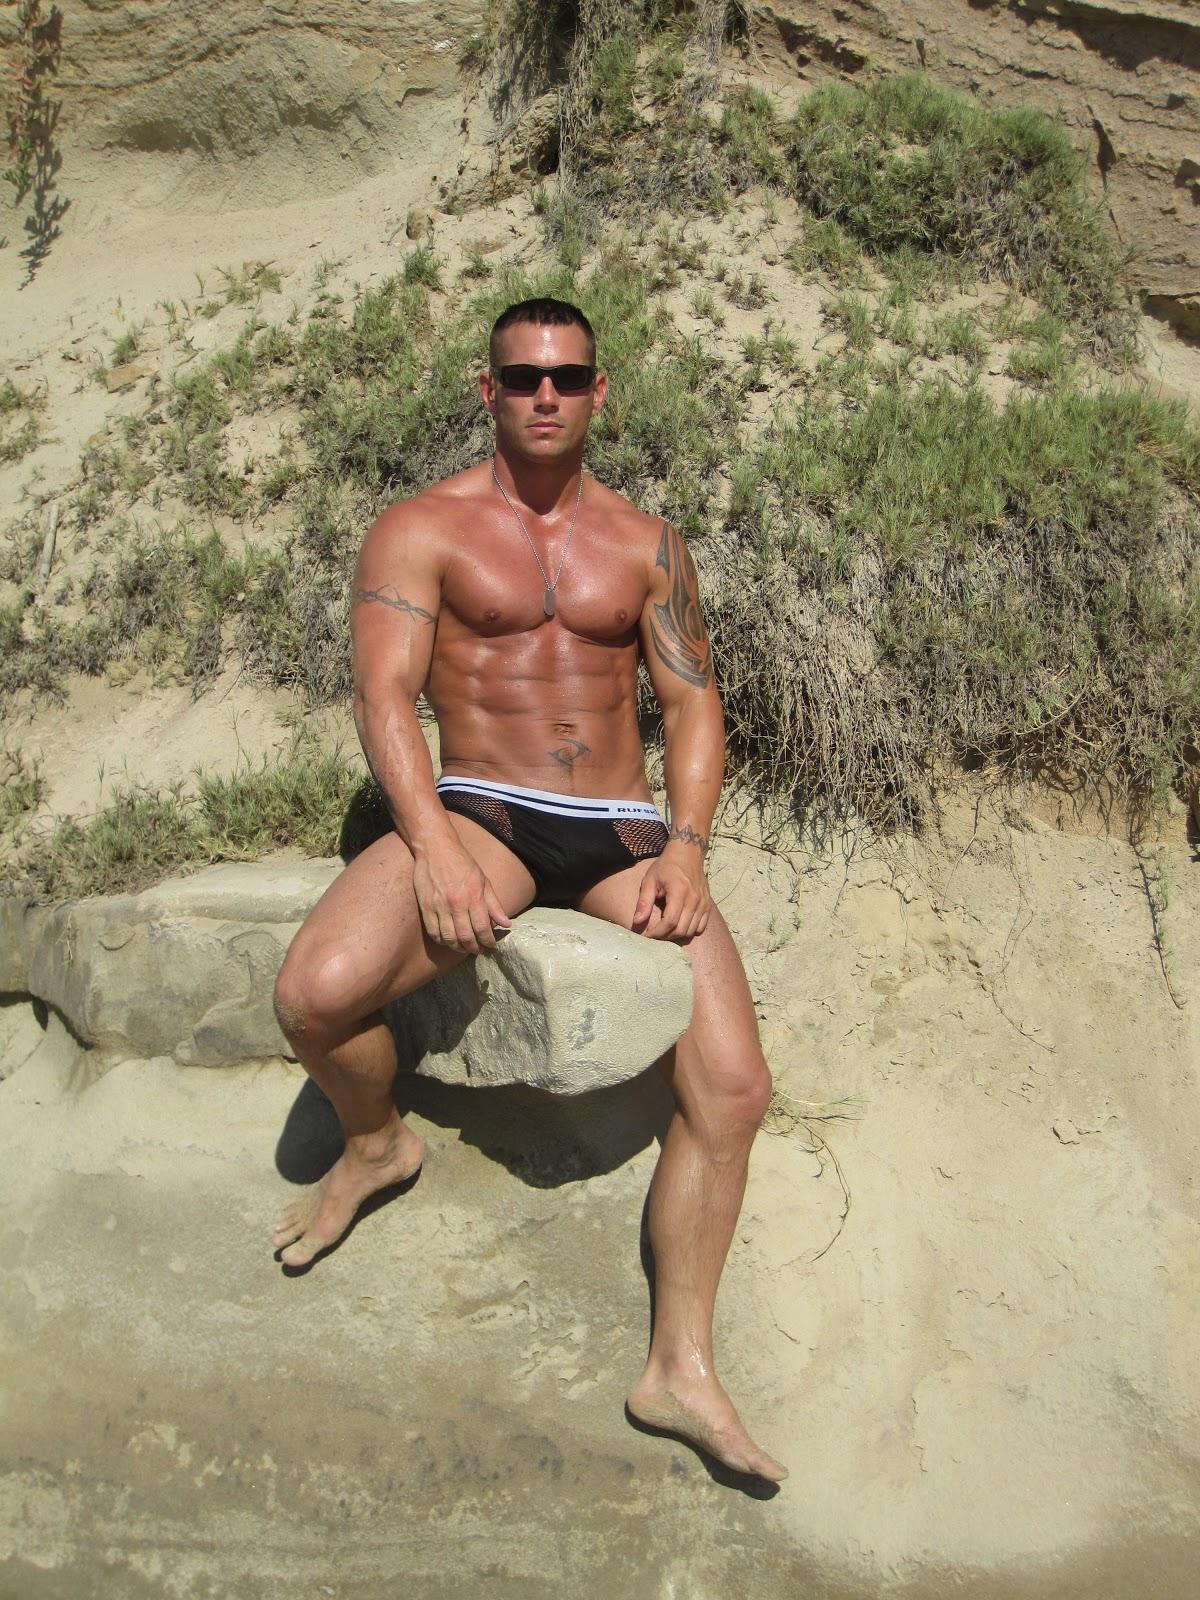 Straight Jock Feet: Super Cute Men with Great Feet